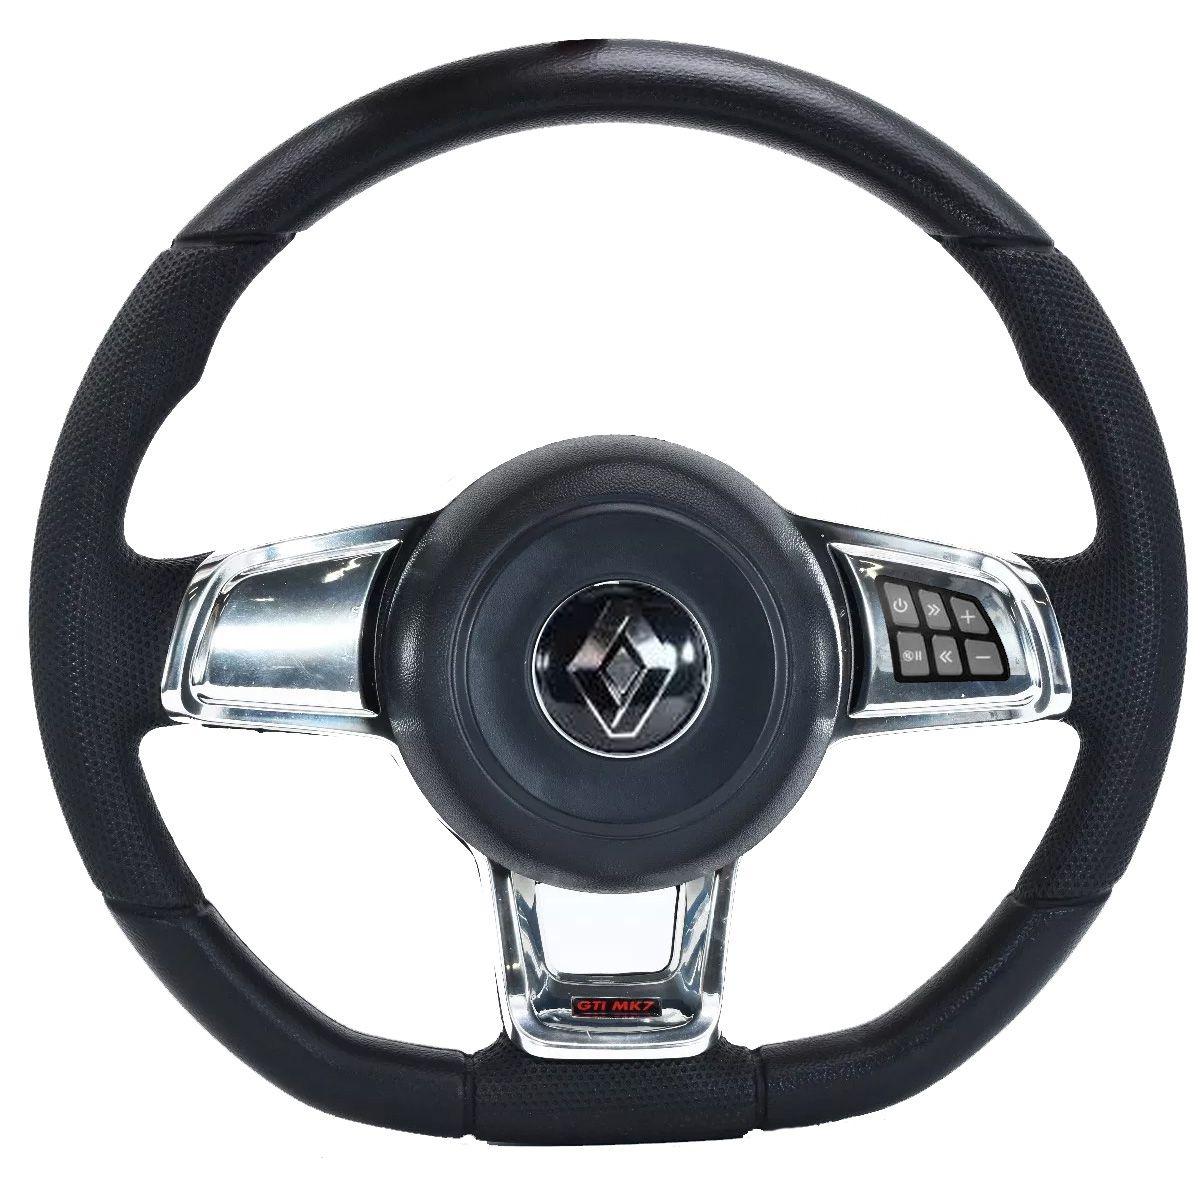 Volante Multifuncional Renault Mk7 Esportivo Cubo Sandero Clio Logan Megane Scenic Poliparts